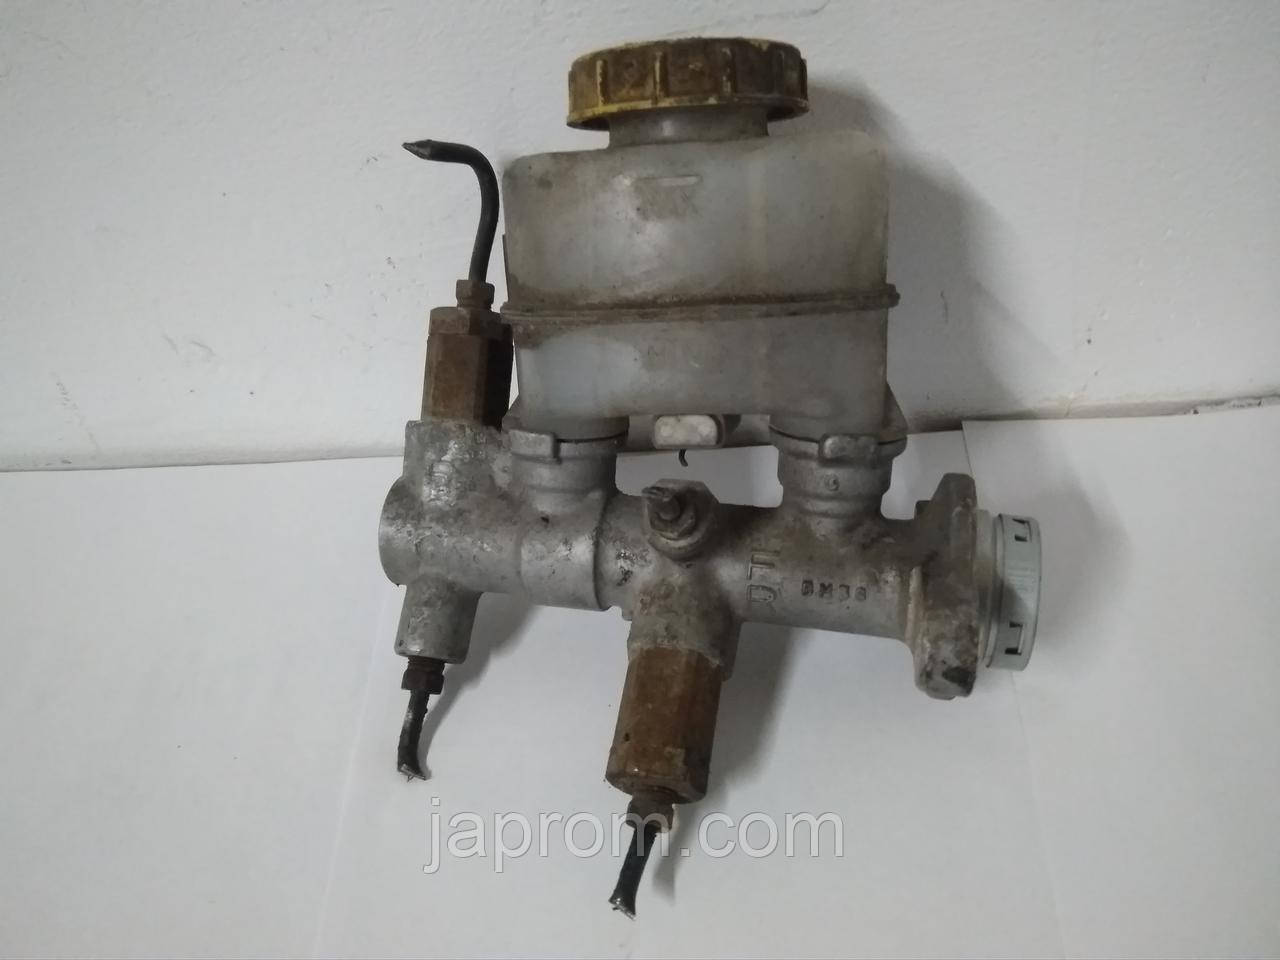 Главный тормозной цилиндр Nissan Almera N15 1990-95 г.в.